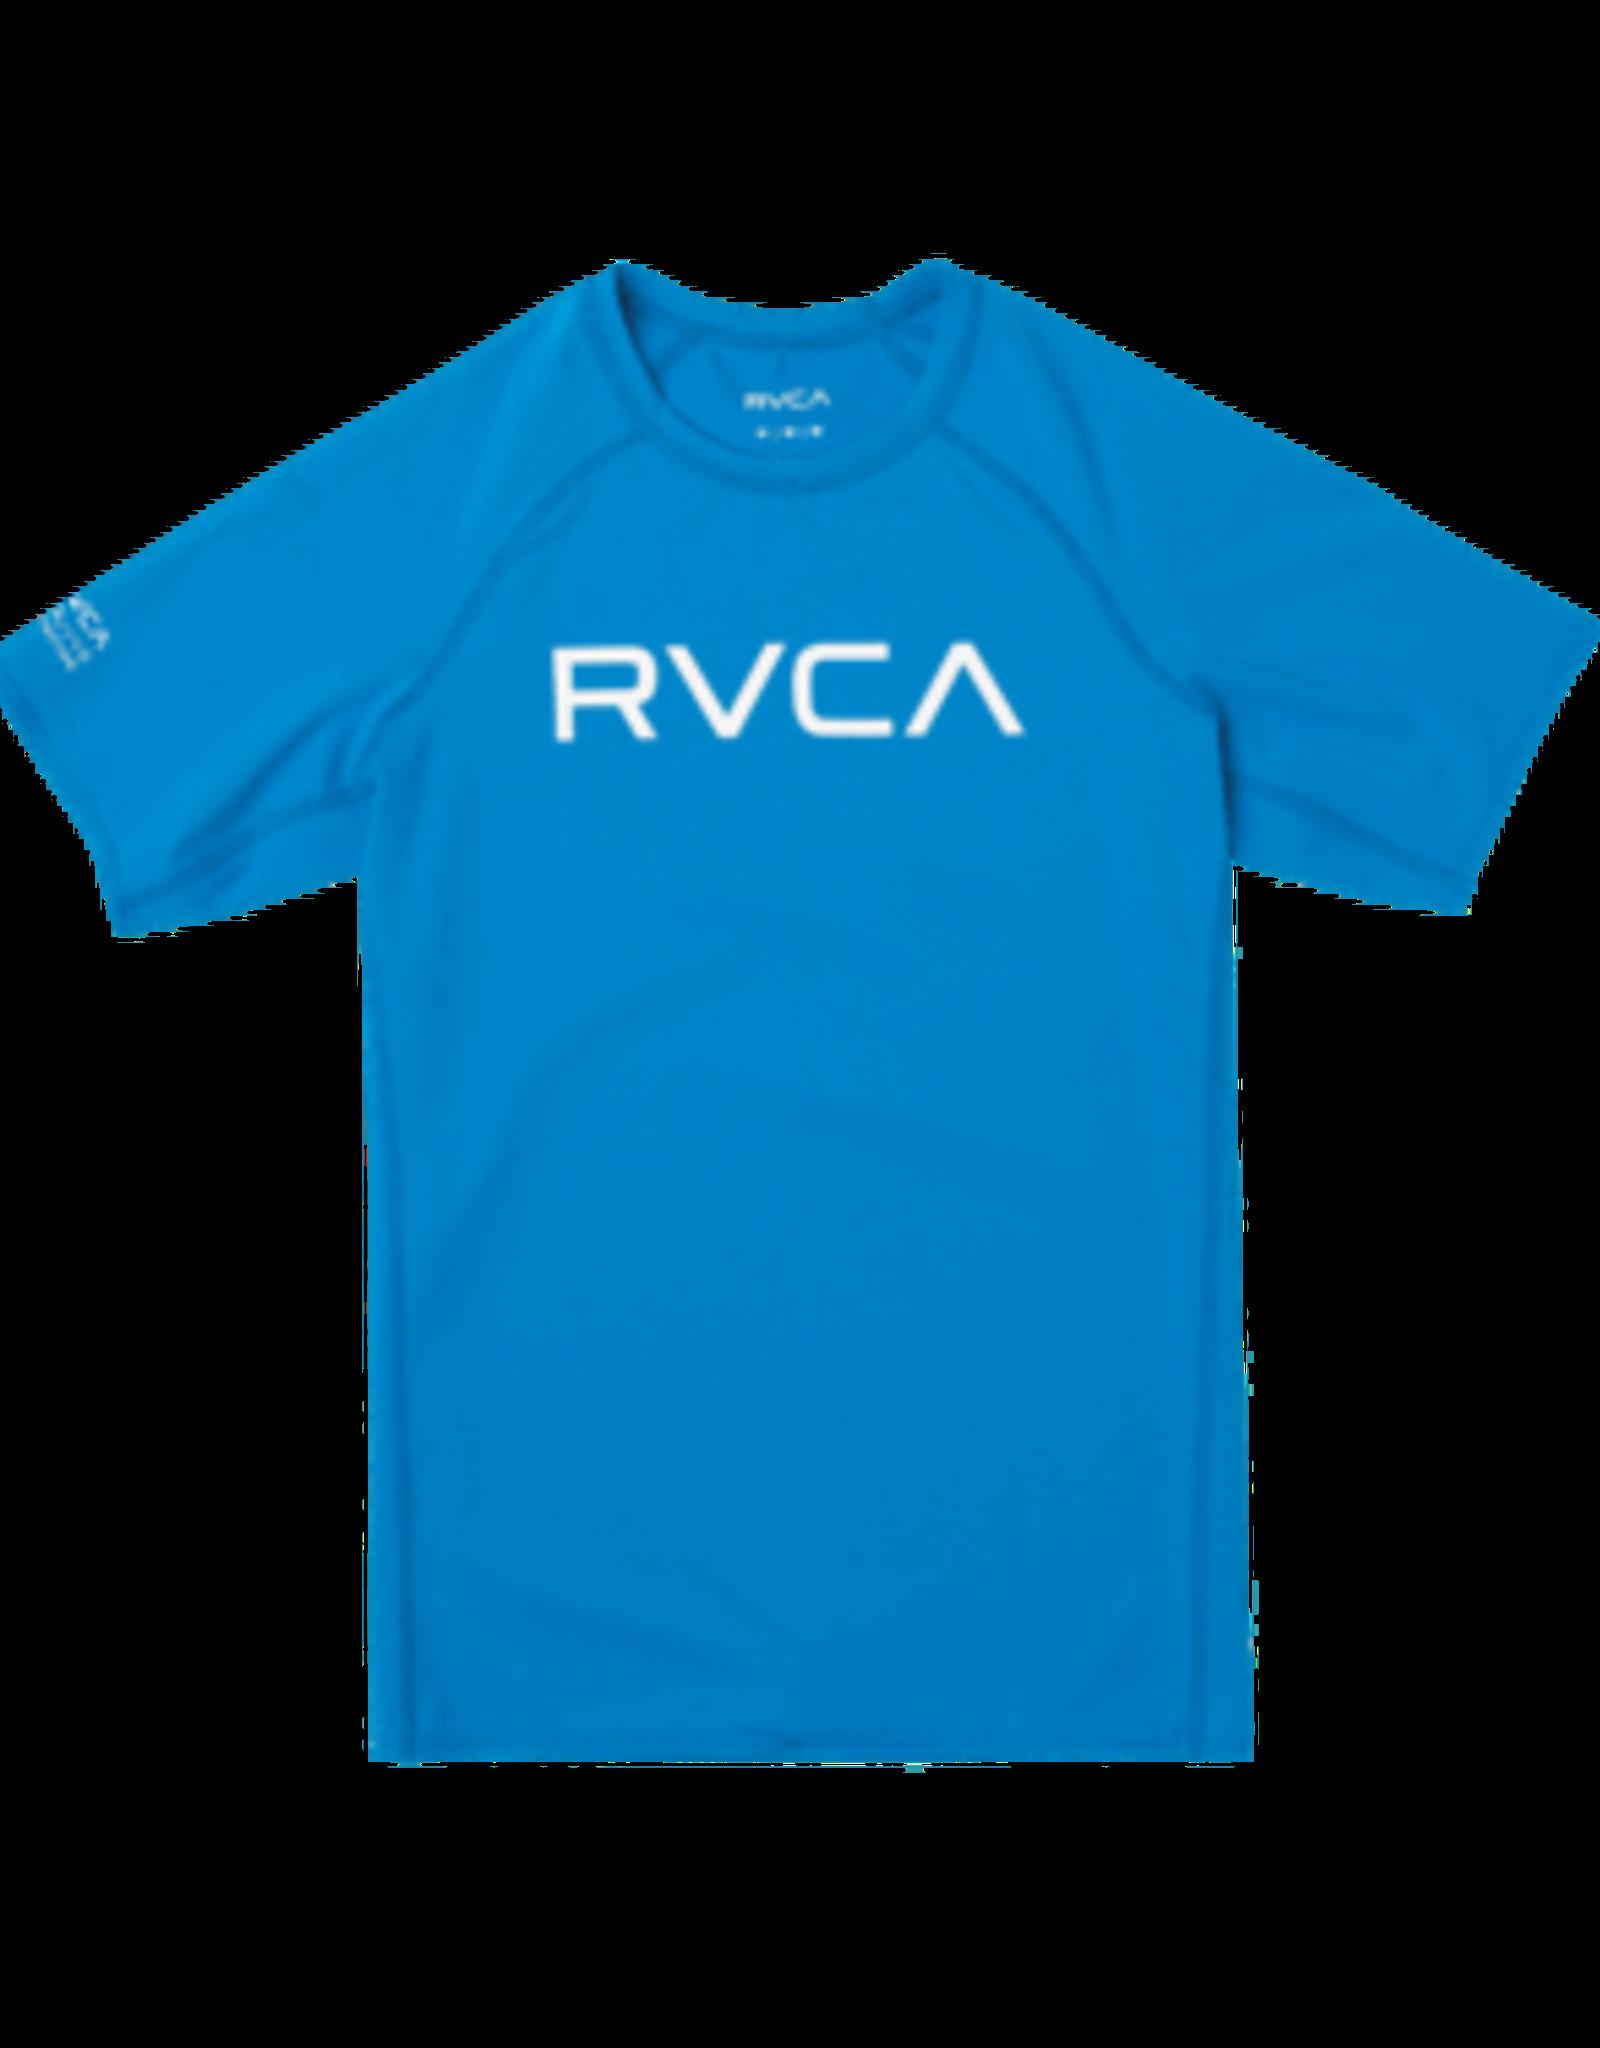 RVCA RVCA RASHGUARD BLUE